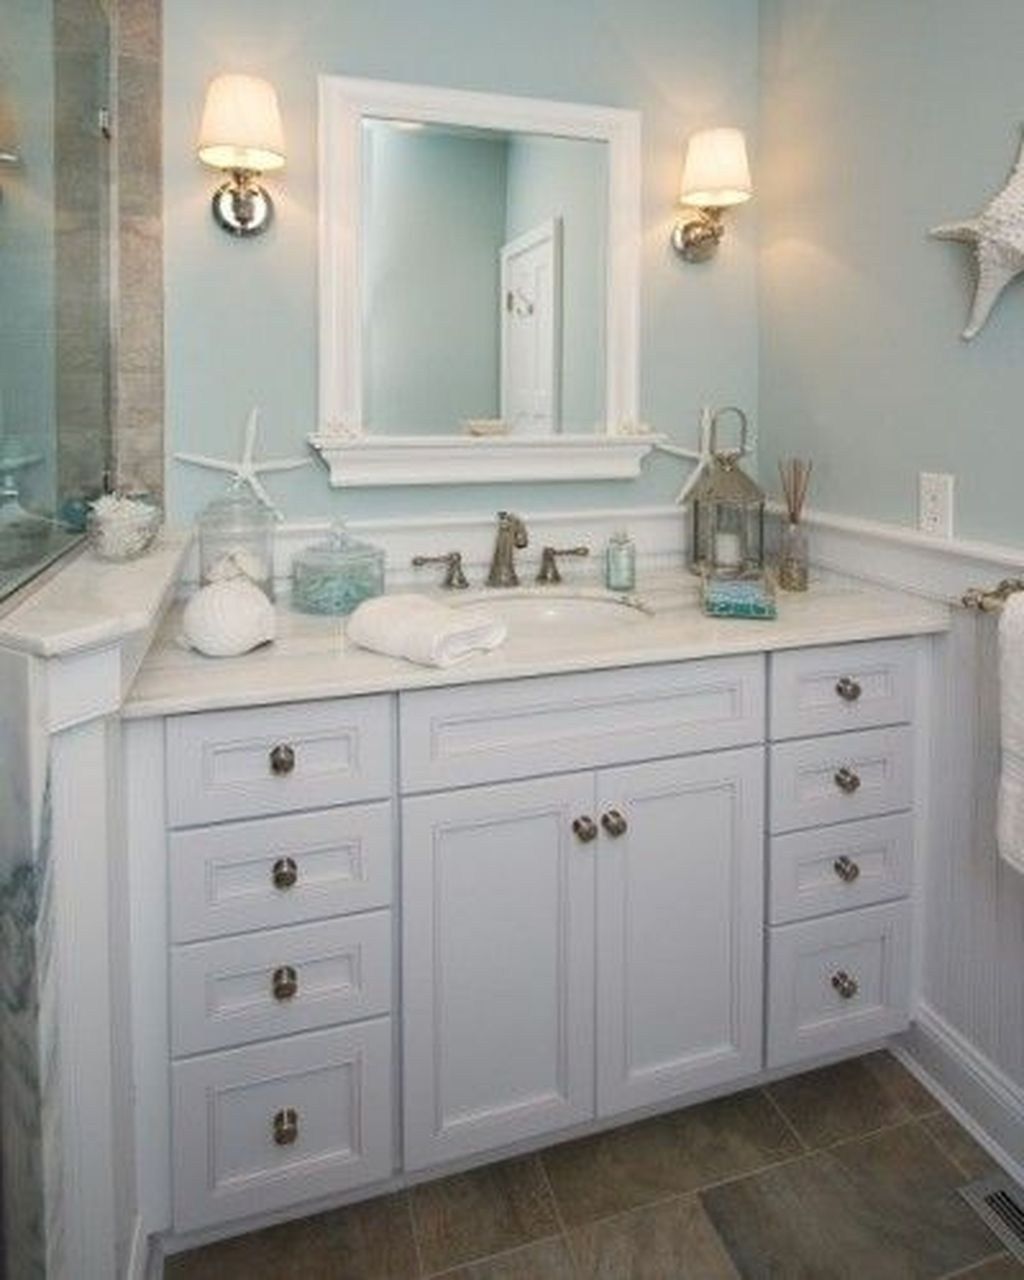 Awesome Gray And Blue Bathroom Design, Beach Decor Bathroom